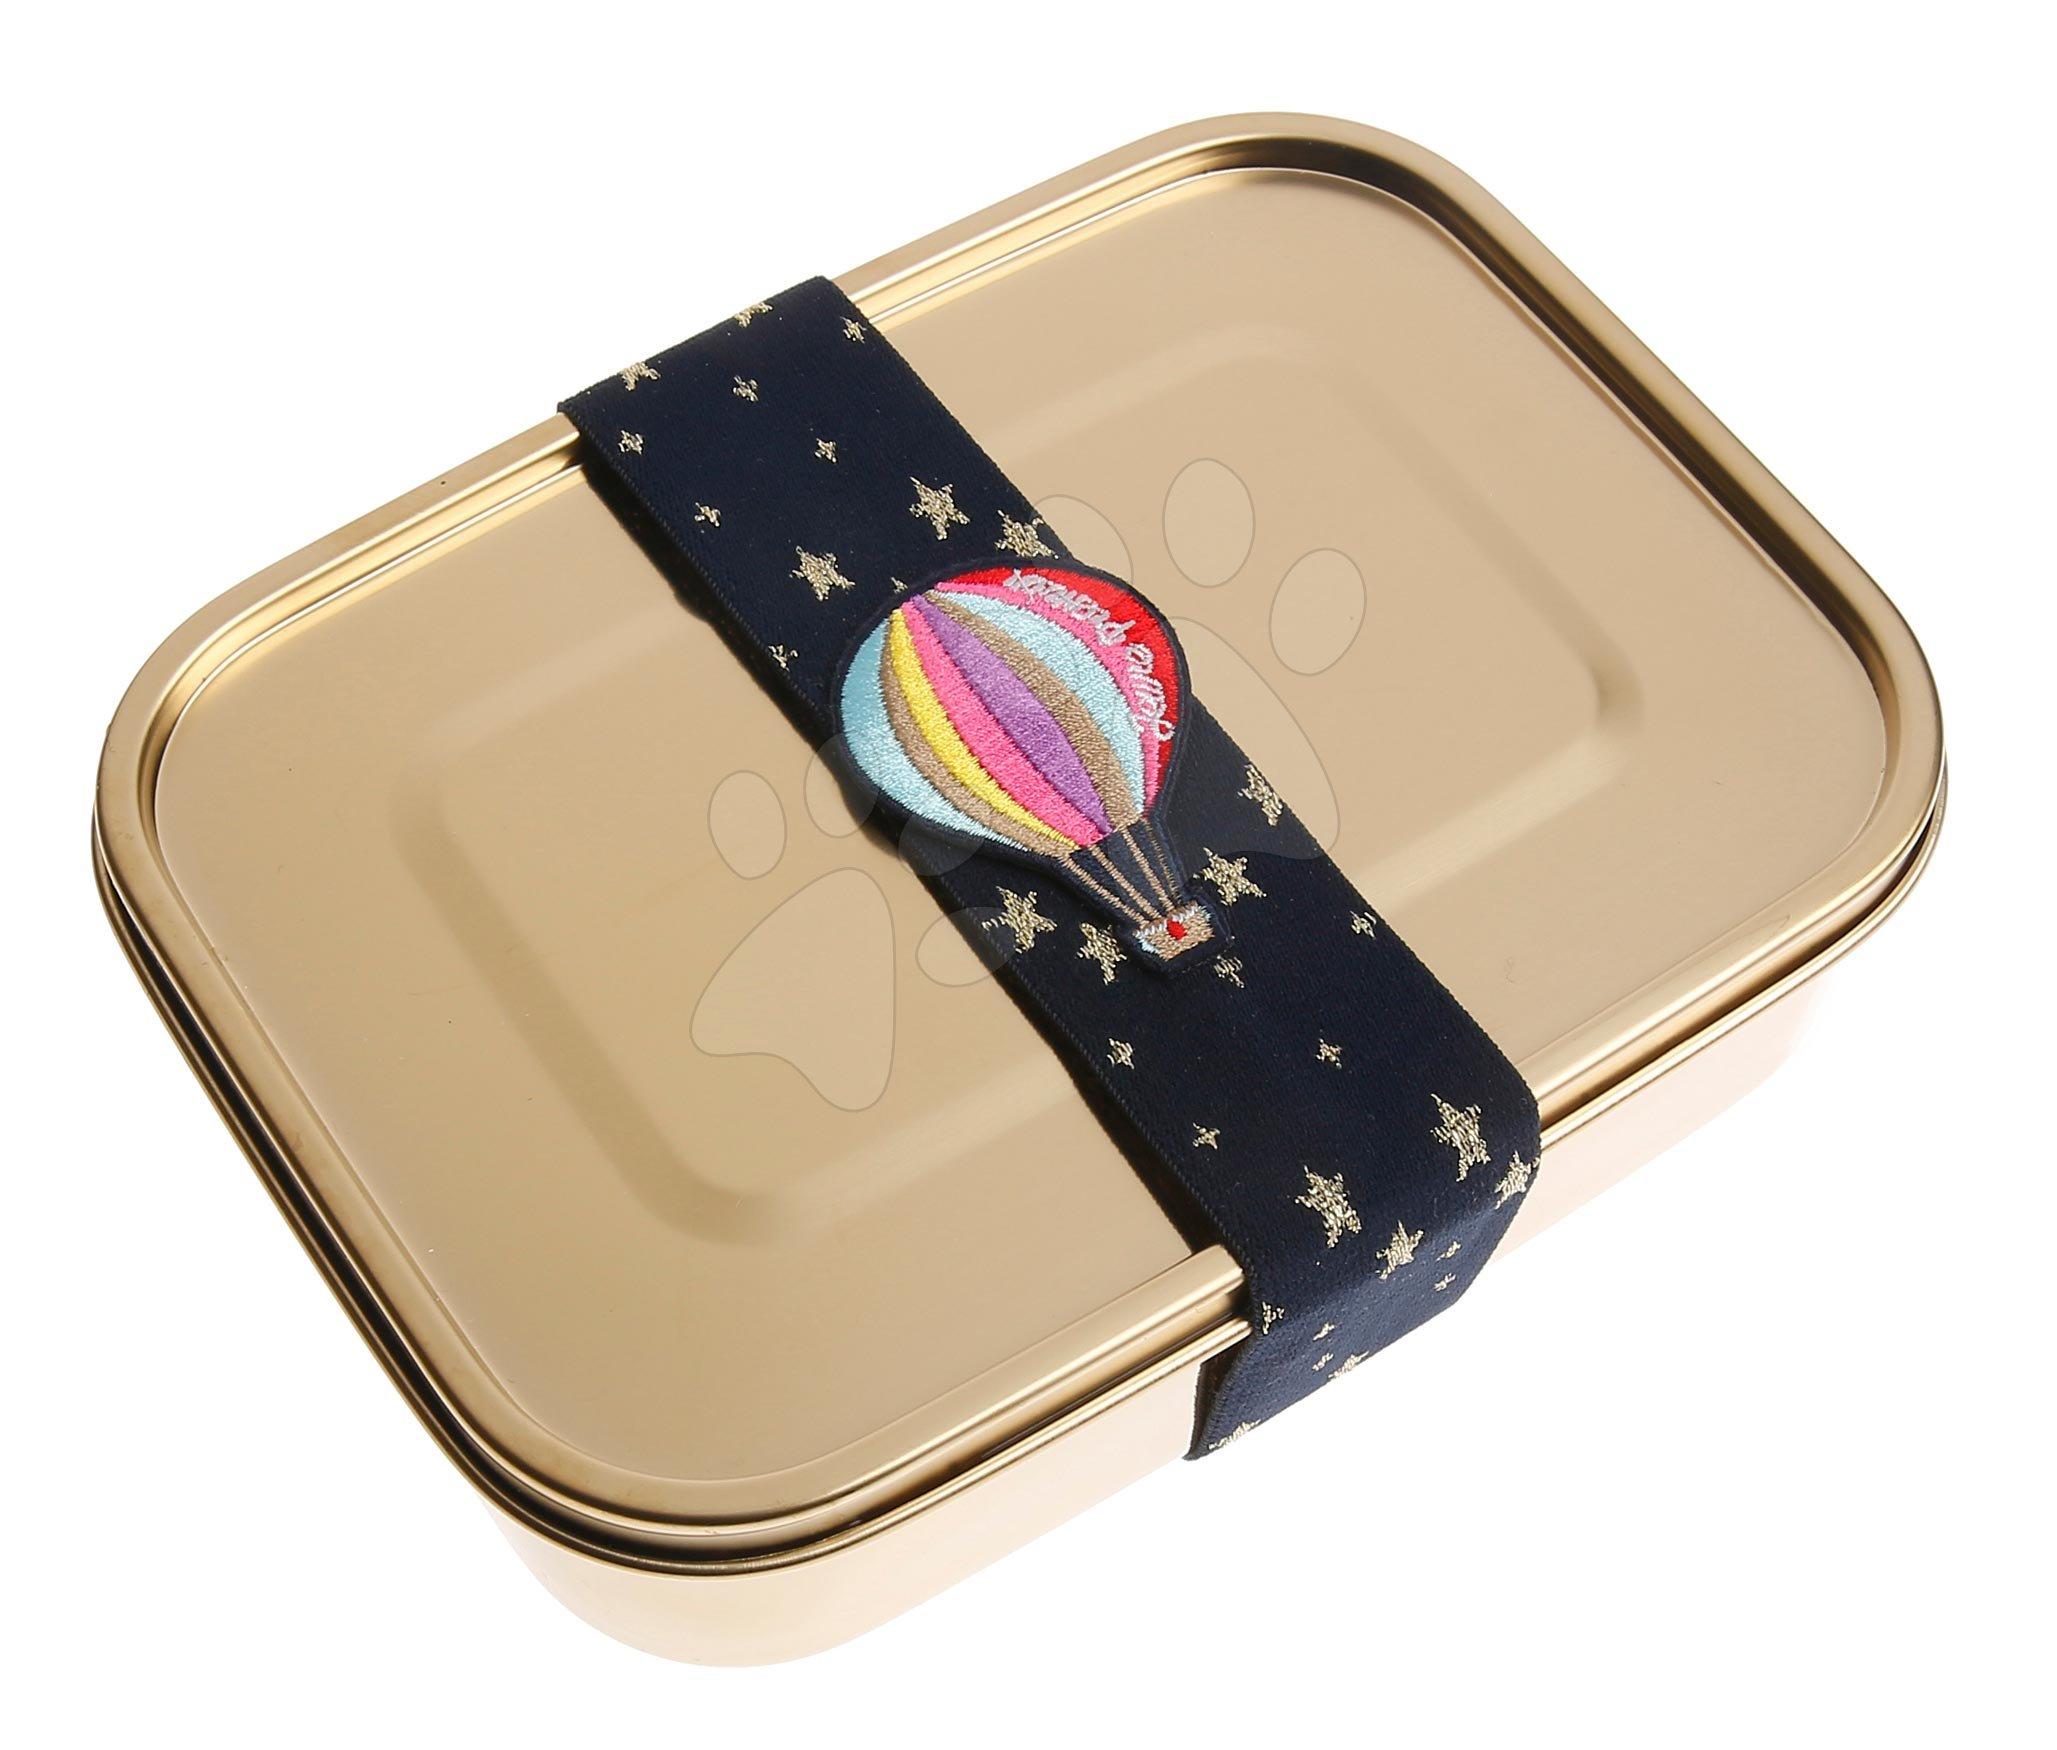 Box na desiatu Stainless Steel Lunchbox Girls Classic gold Balloons Jeune Premier 100% nehrdzavejúca oceľ luxusné prevedenie 21*7 cm